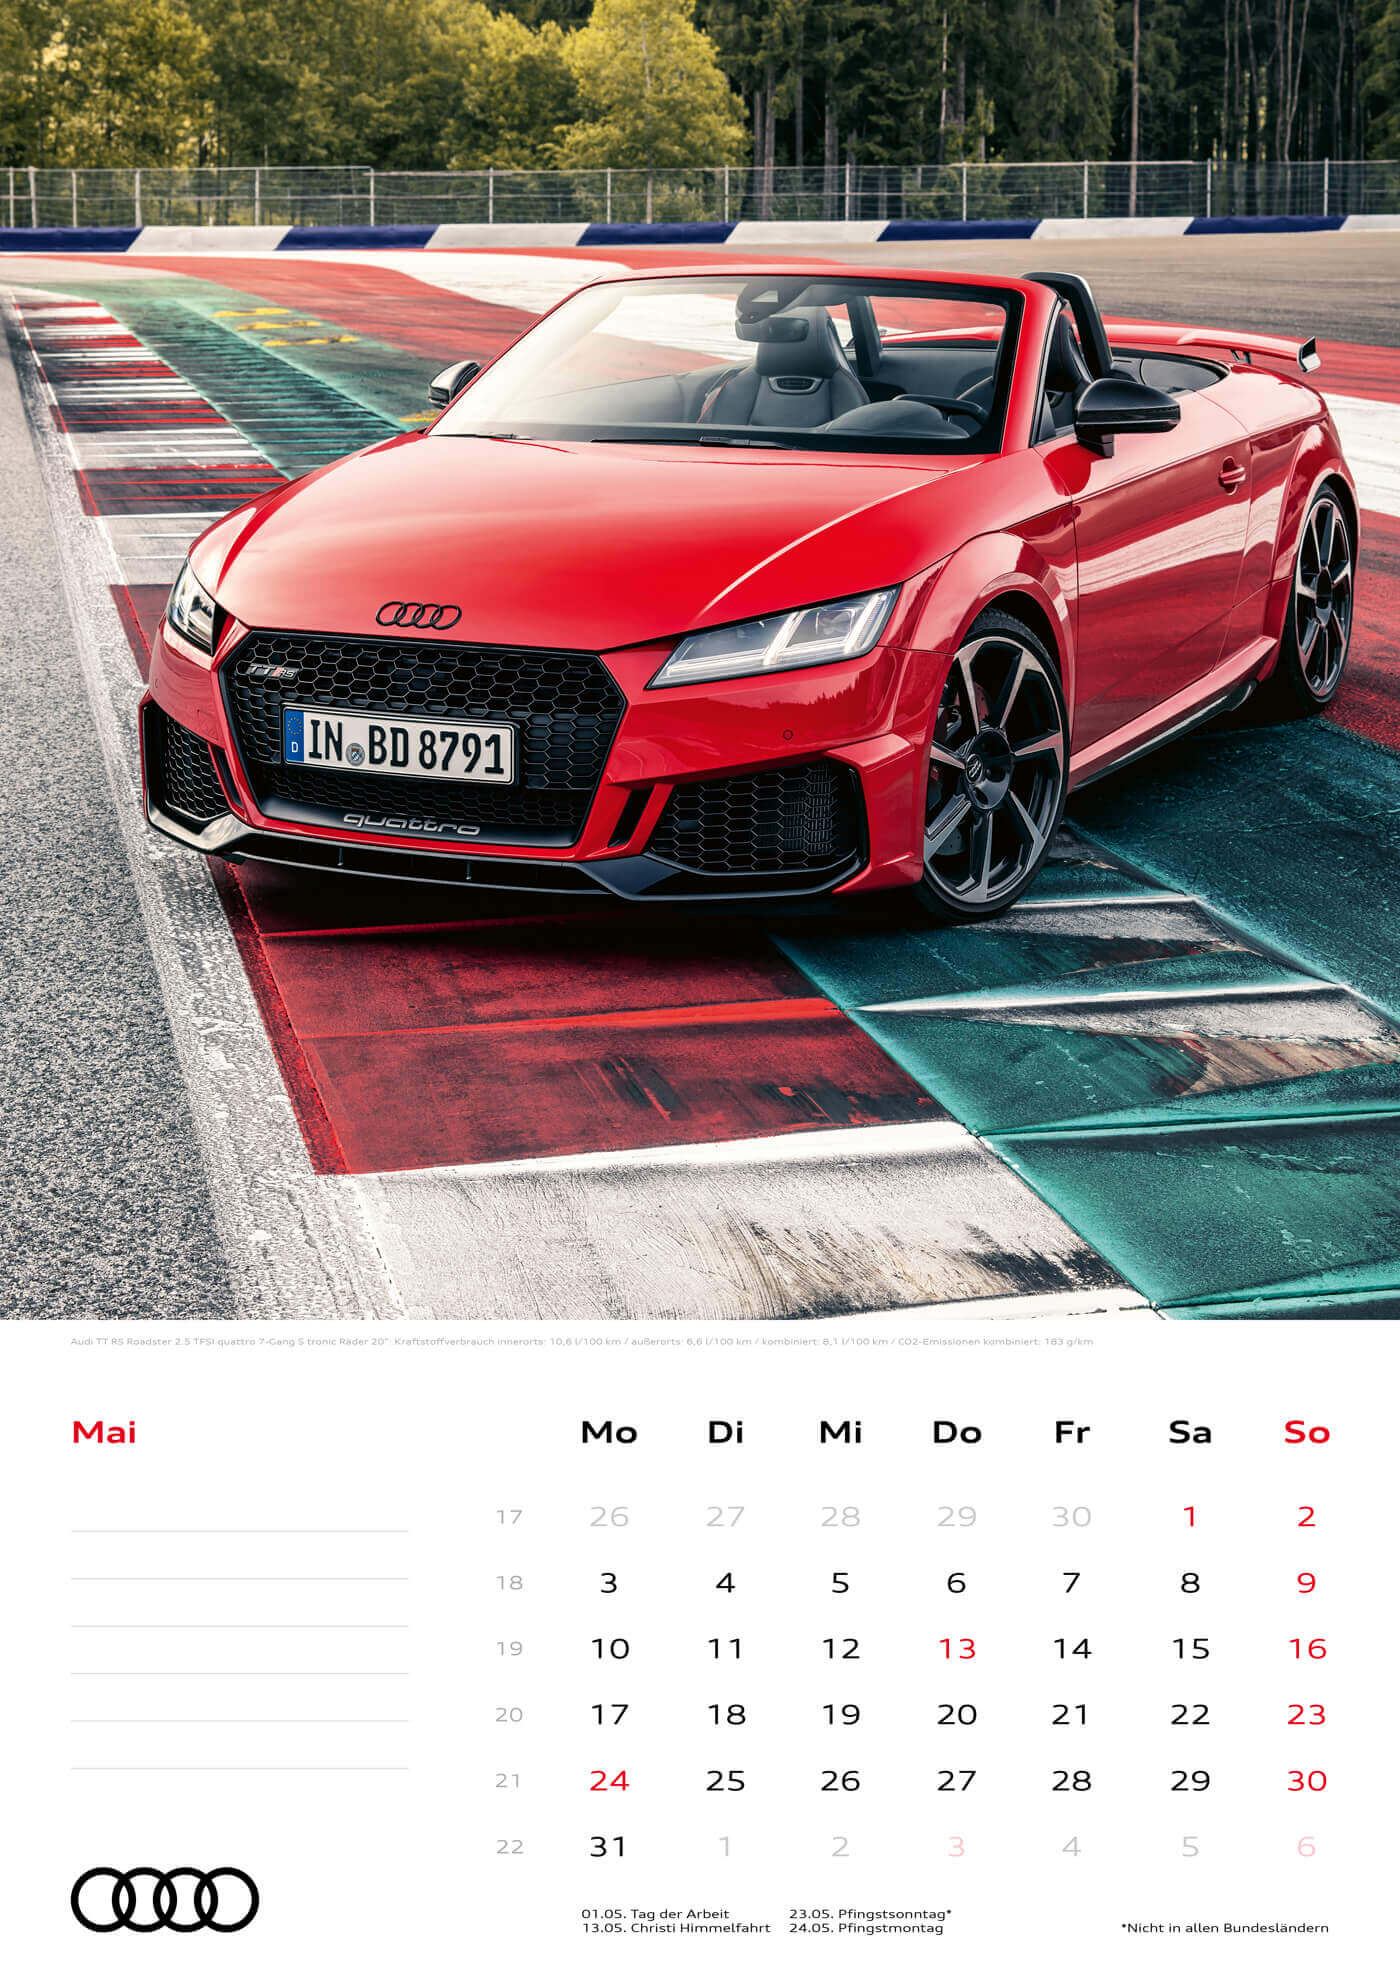 Audi Kalender 2021 - DIN A3 / Audi TTRS Roadster